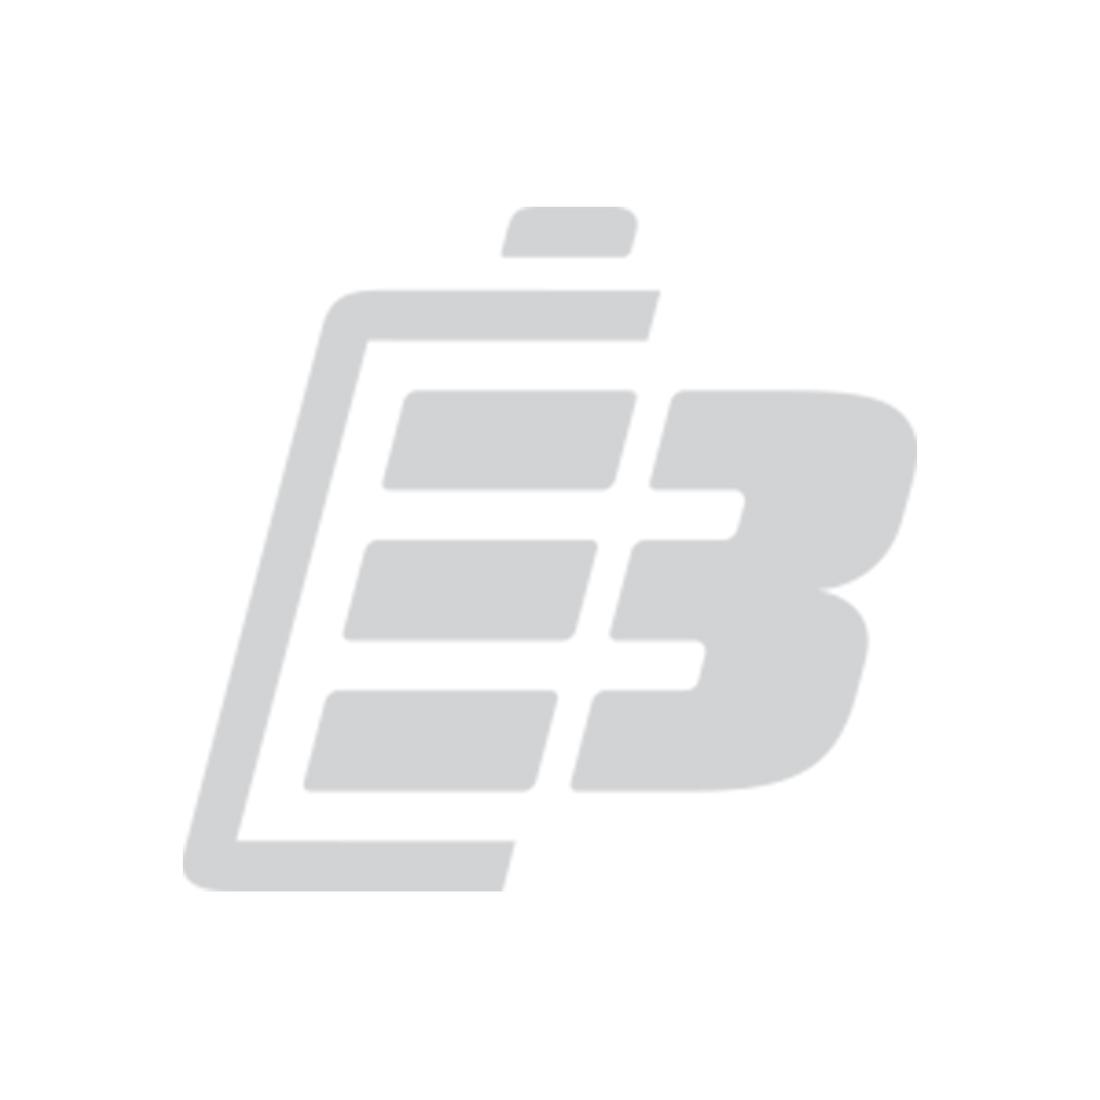 Power tool battery Makita 9.6V 3.0Ah_1